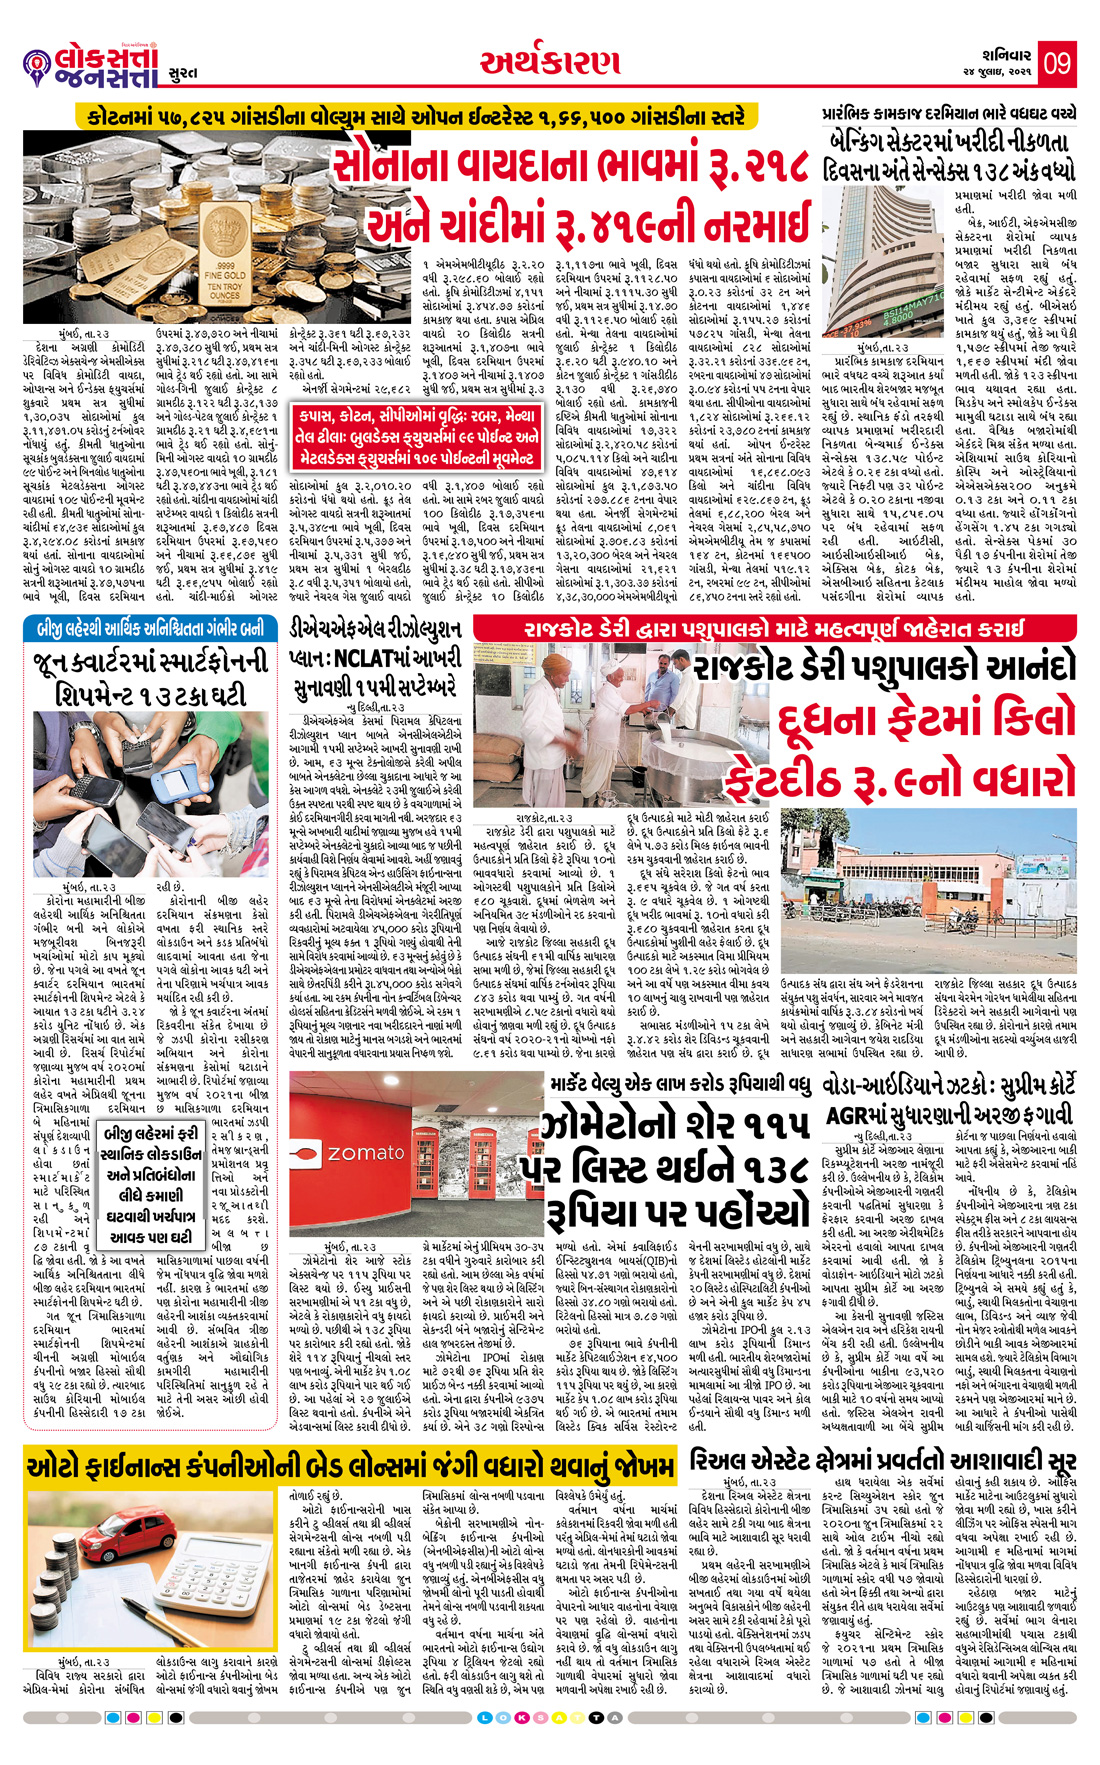 Loksatta Jansatta News Papaer E-paper dated 2021-07-24 | Page 9